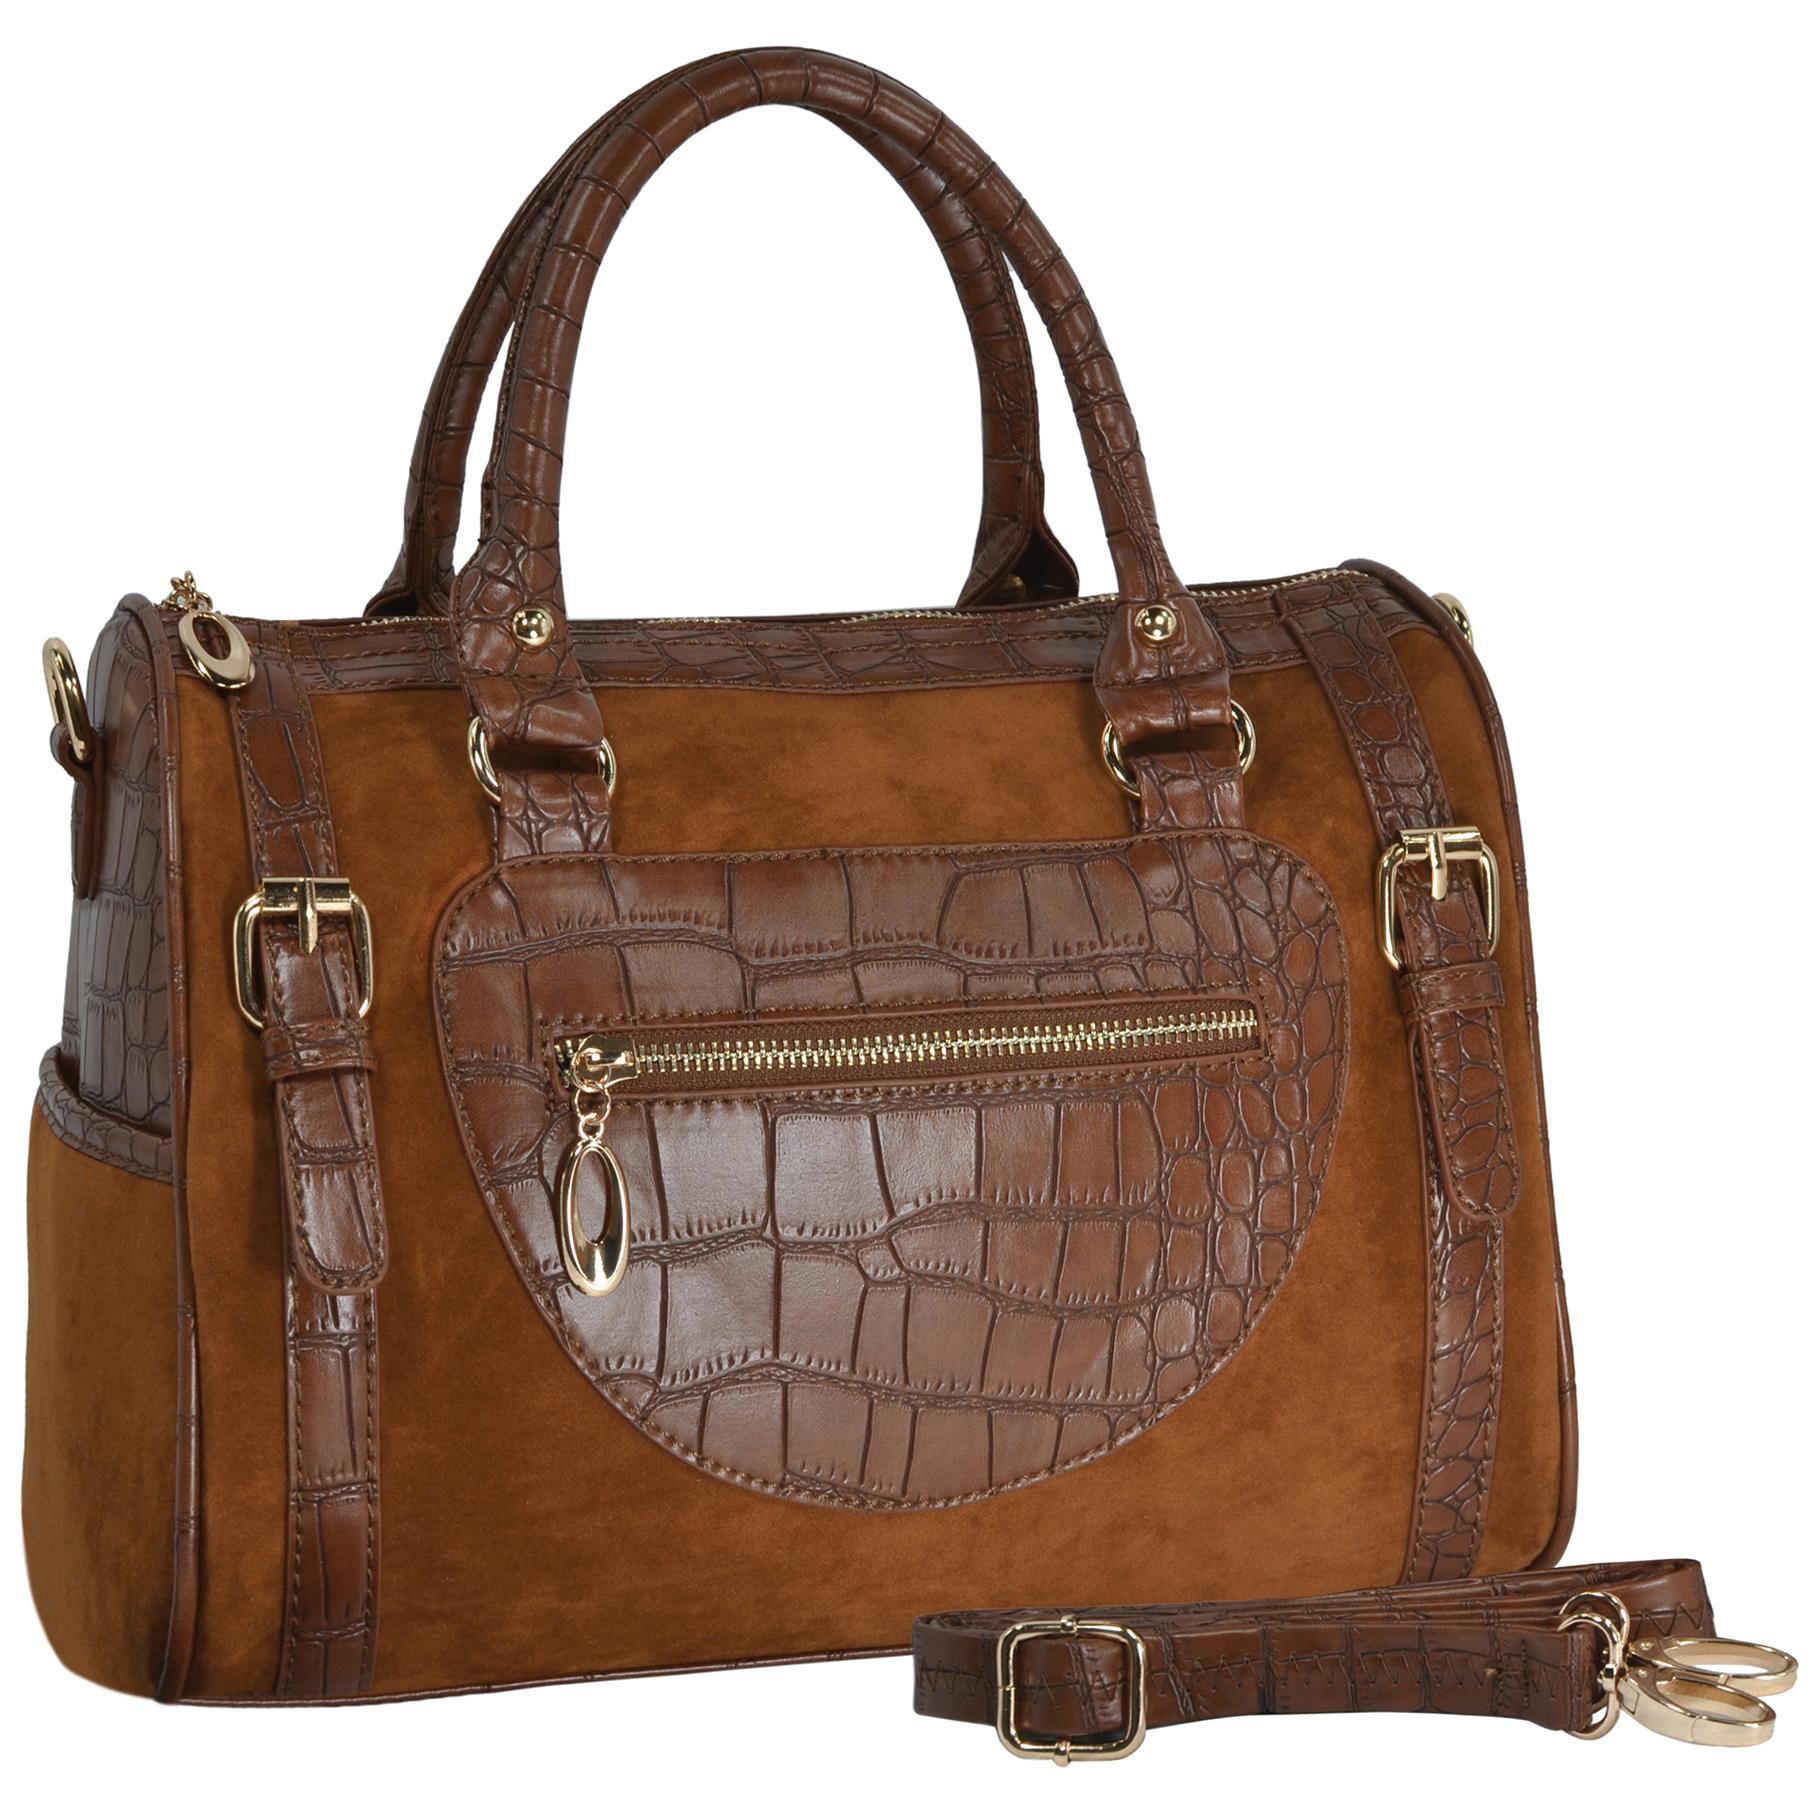 mg-collection-brandi-brown-bowler-handbag-tb-h0339brn-1.jpg